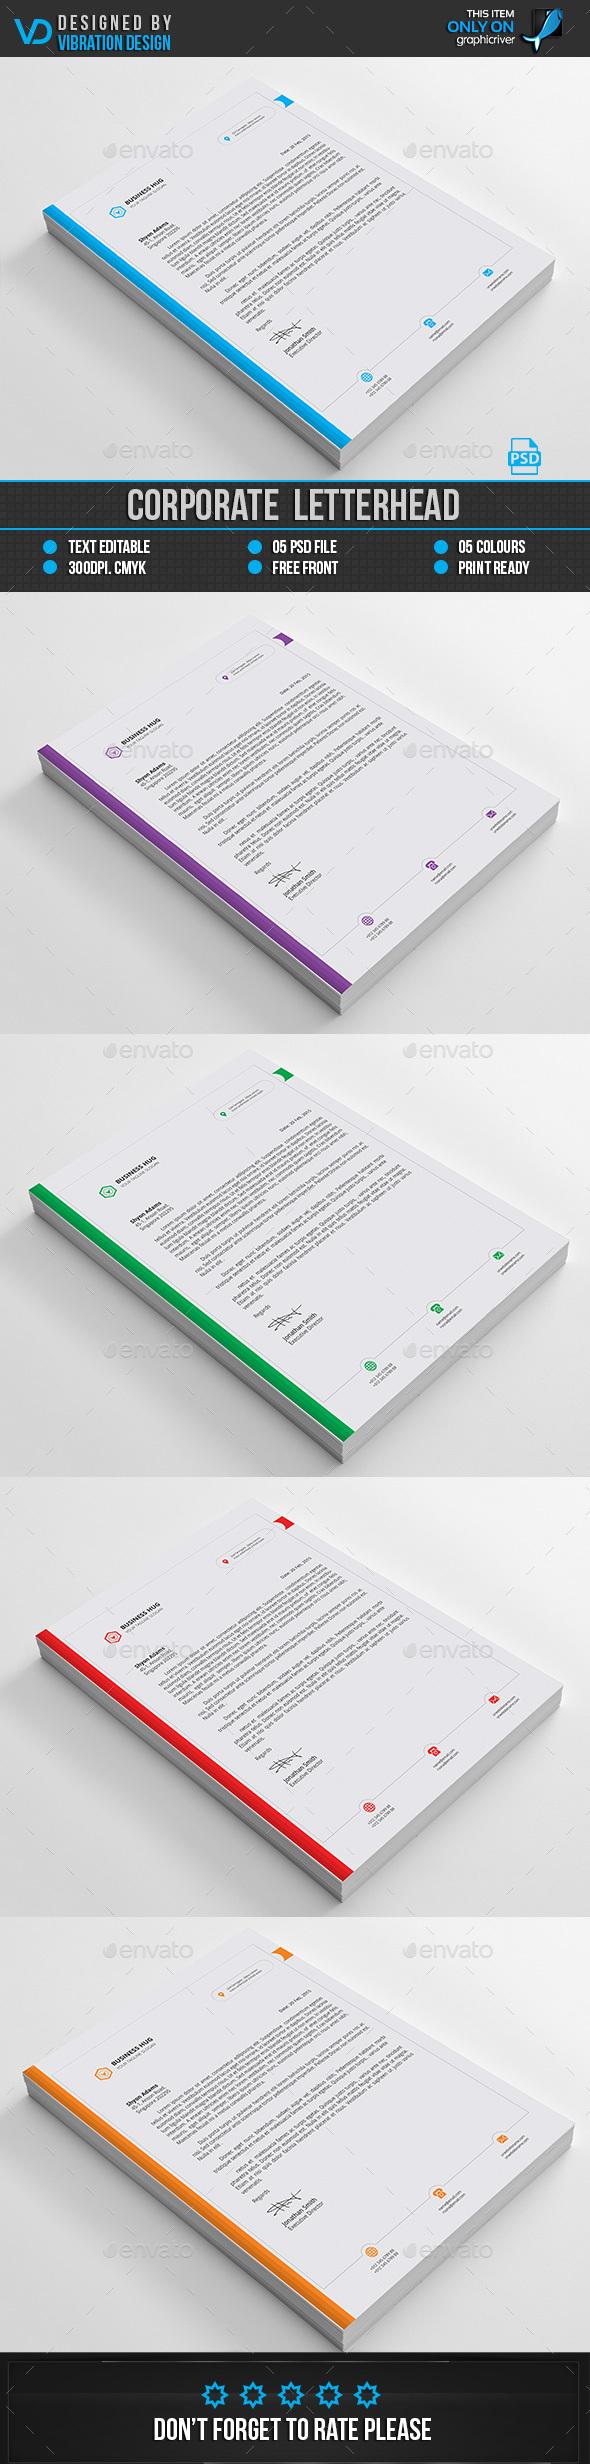 Corporateletterhead  Stationery Print TemplatesDownload Here